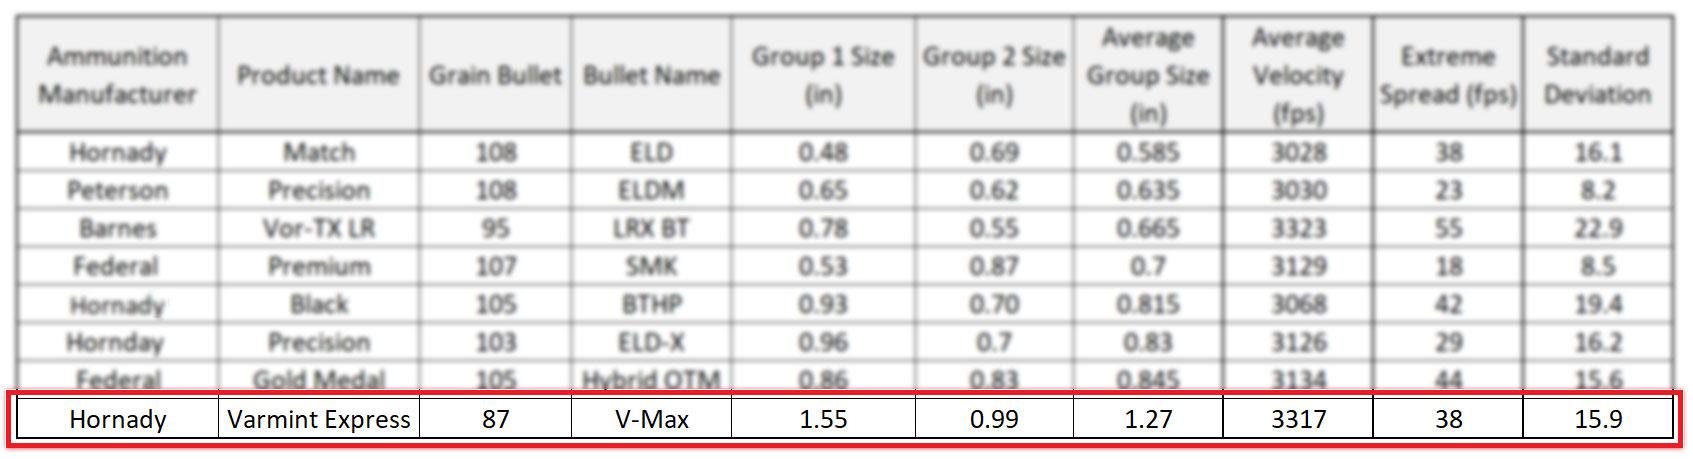 Hornady Varmint Express 87 grain VMax - 6mm Creedmoor Ammunition Accuracy Results